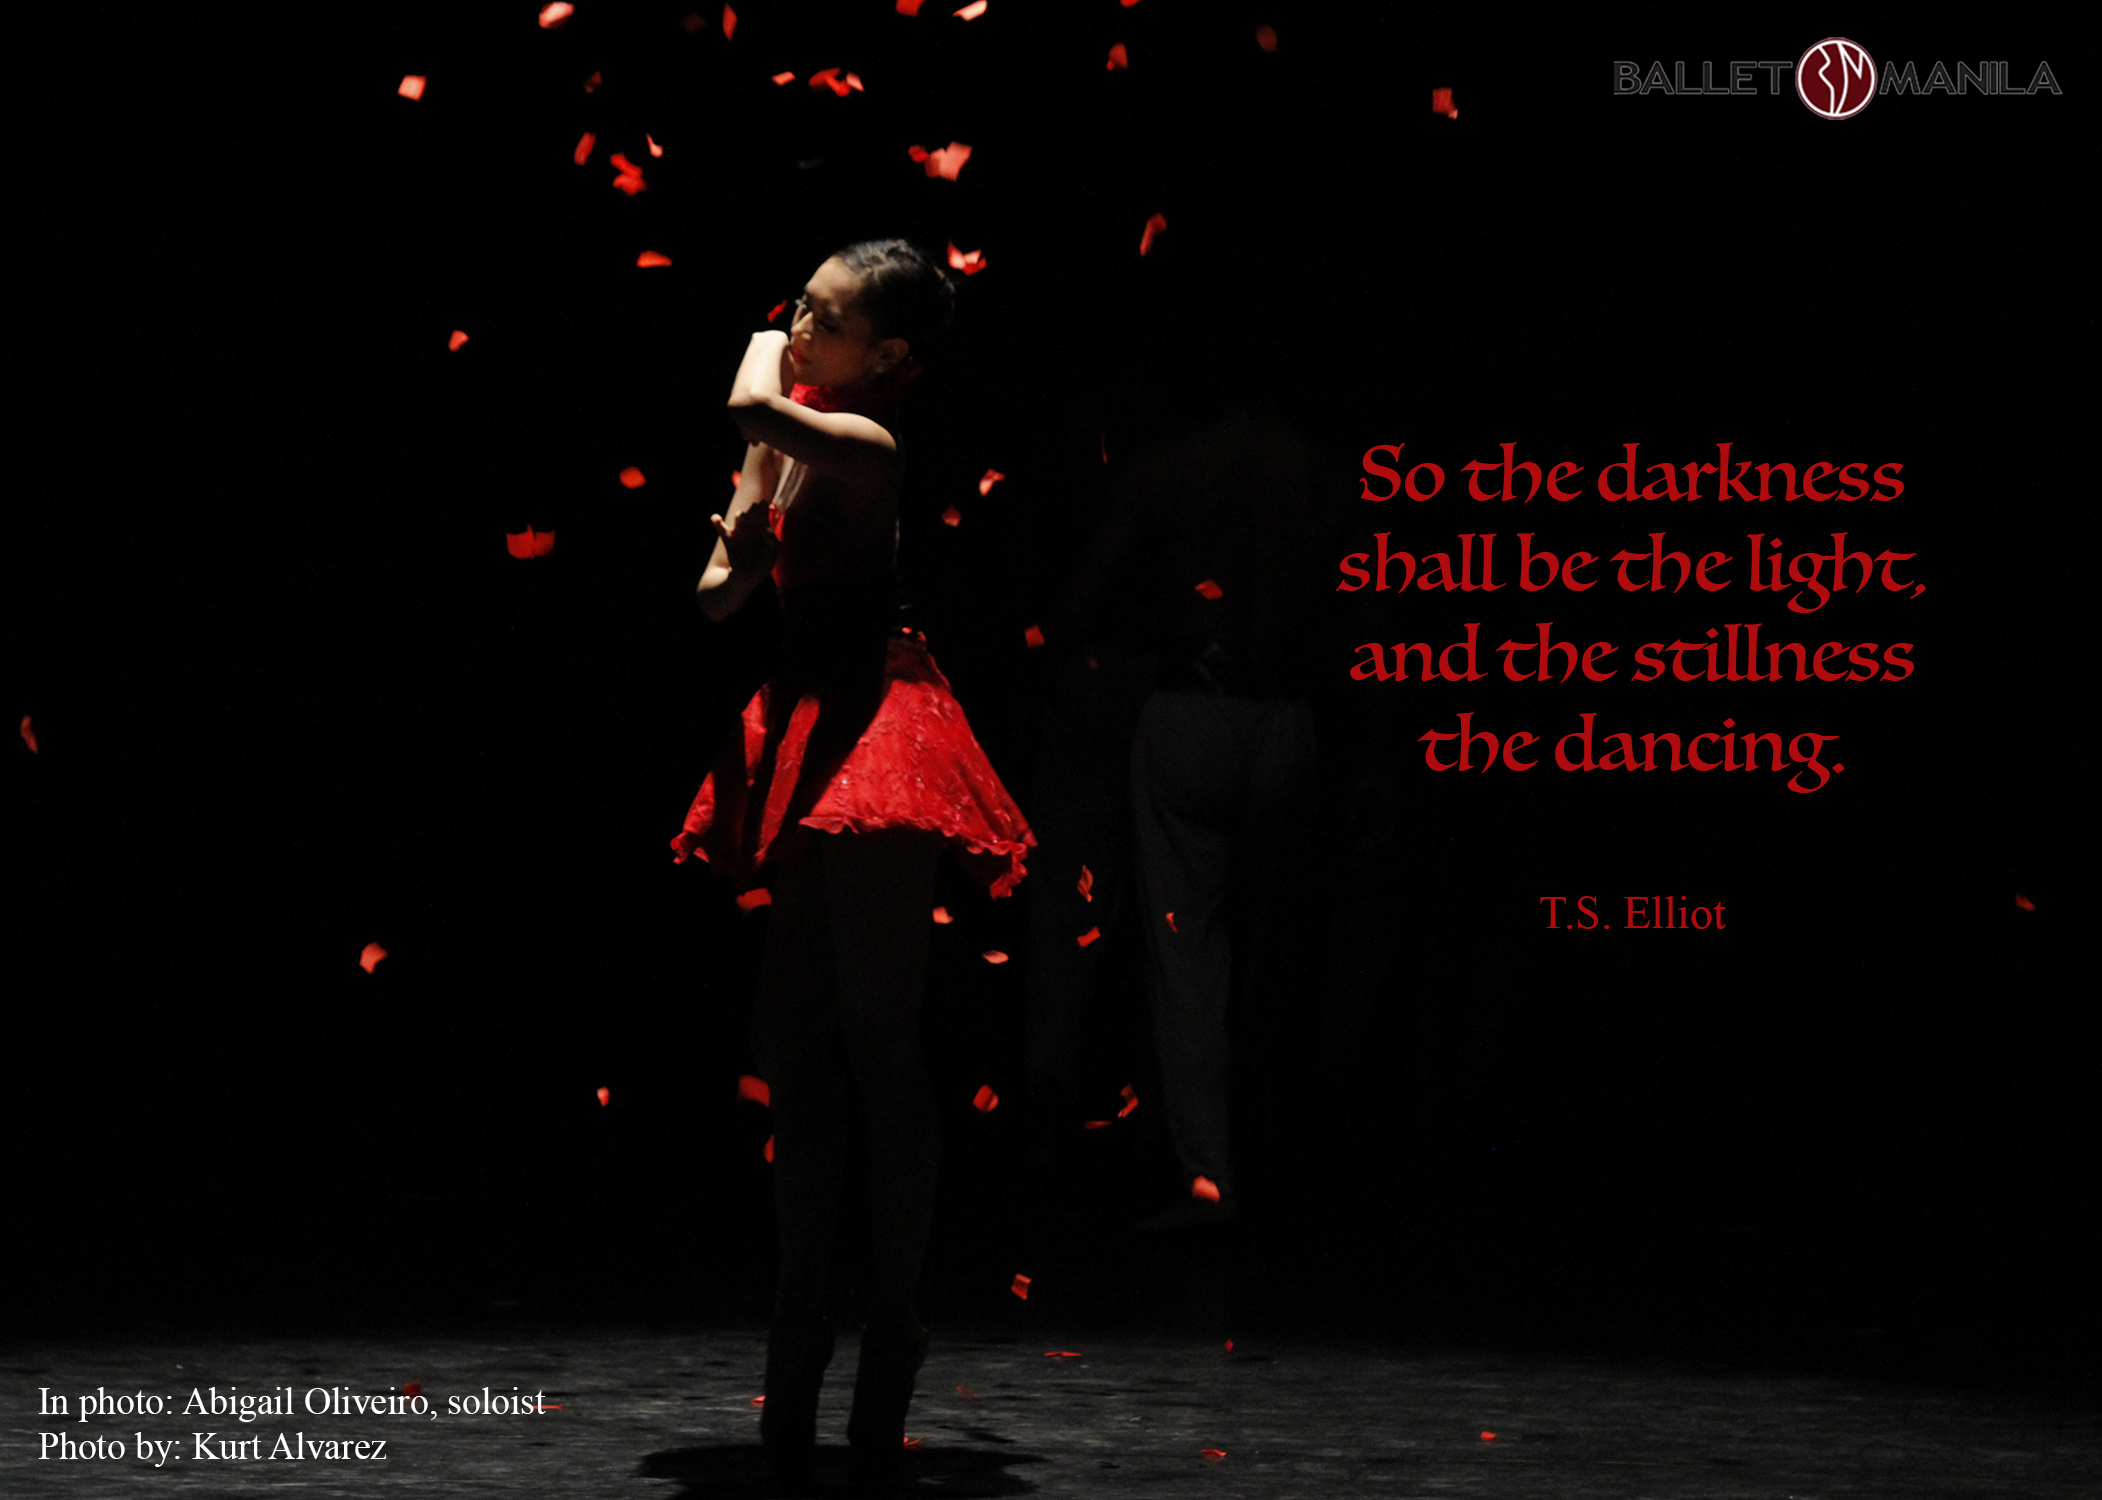 Talk about dance: TS Elliot - Ballet Manila Archives